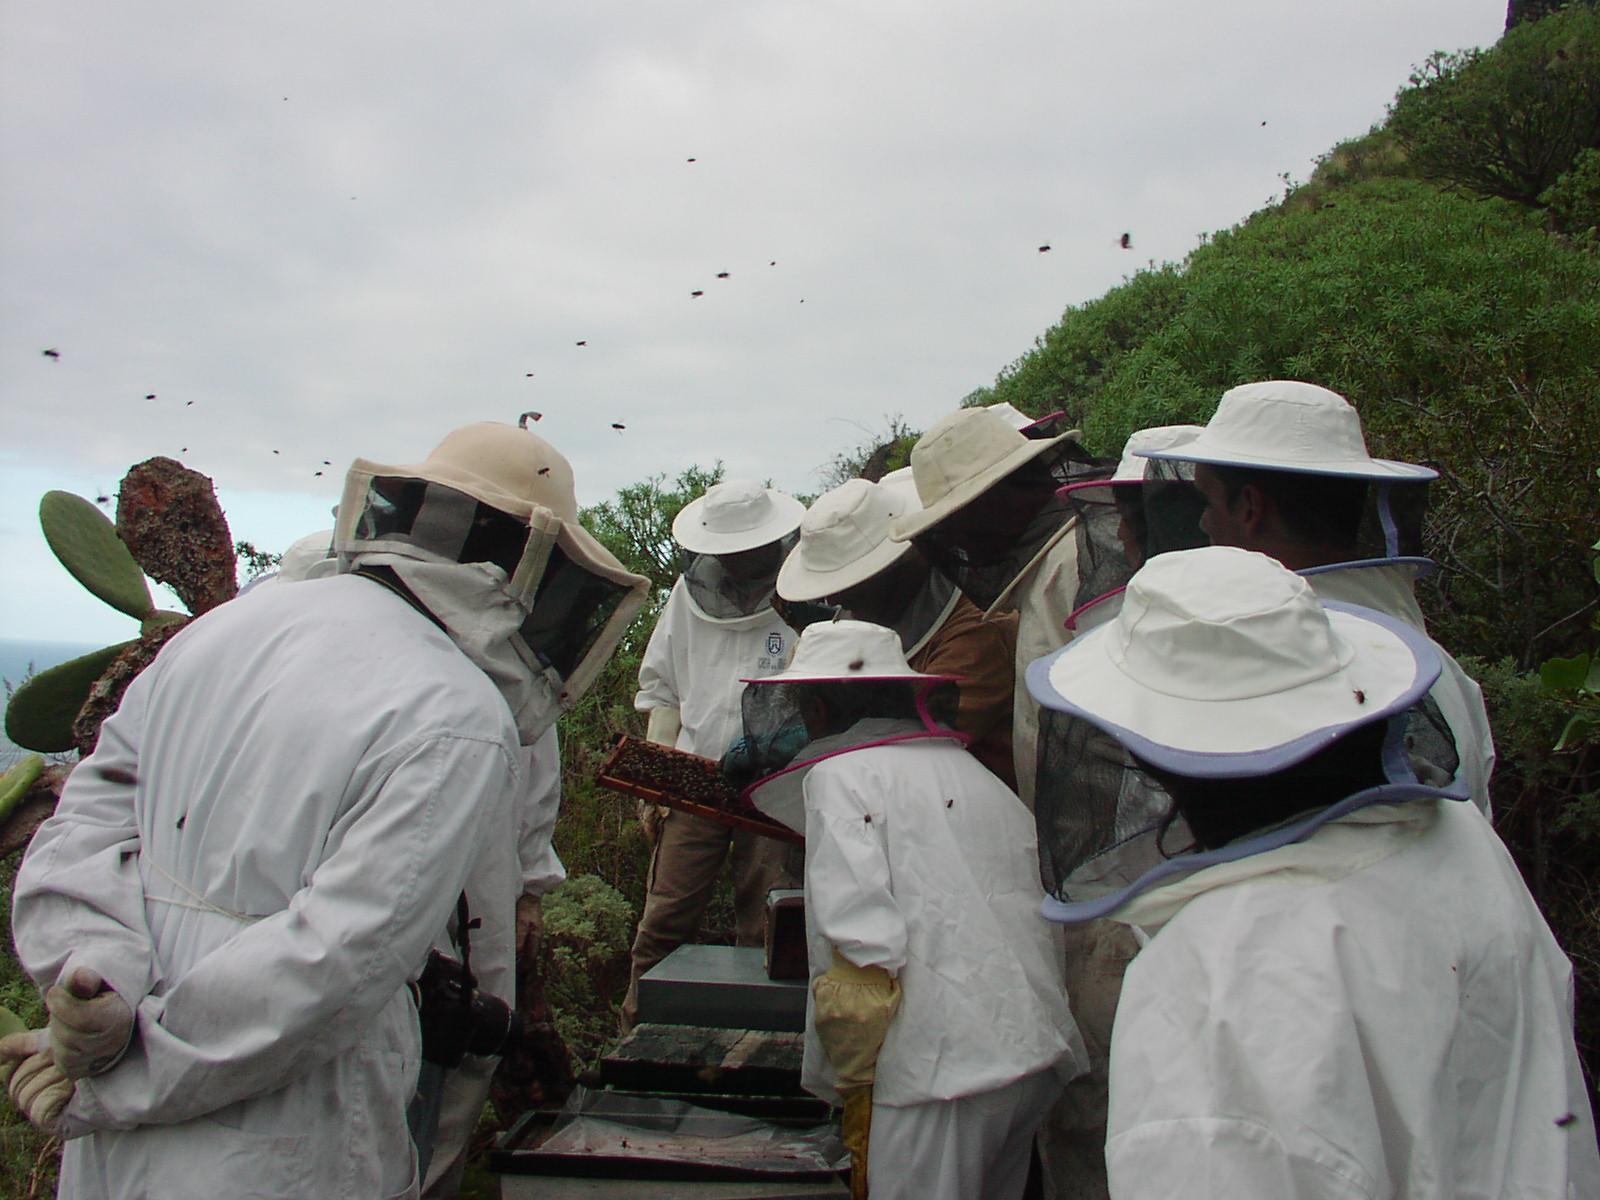 Curso de apicultura en Tenerife